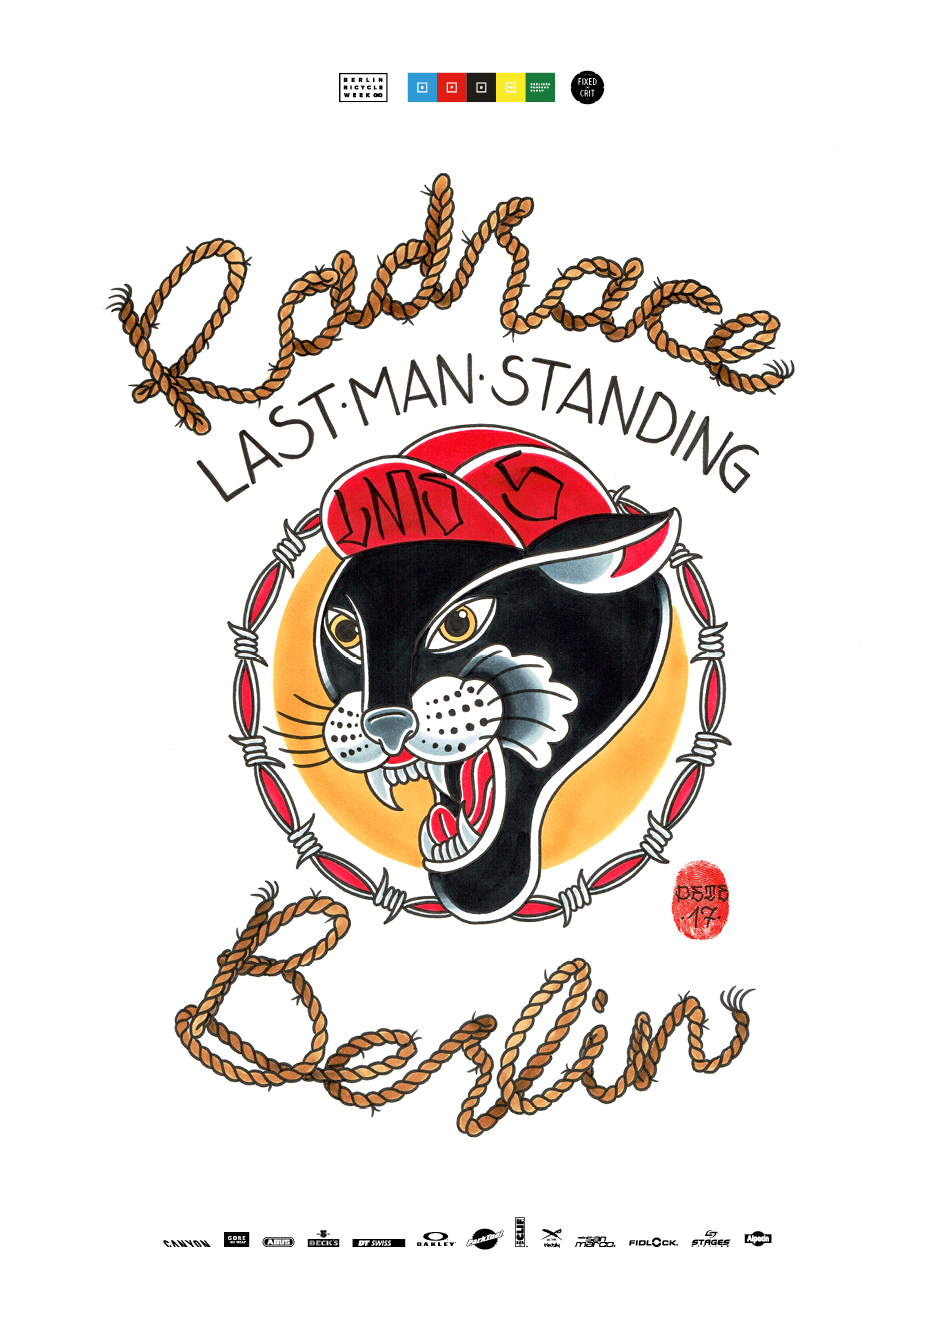 RAD RACE LAST MAN STANDING BERLIN 24.03.2018